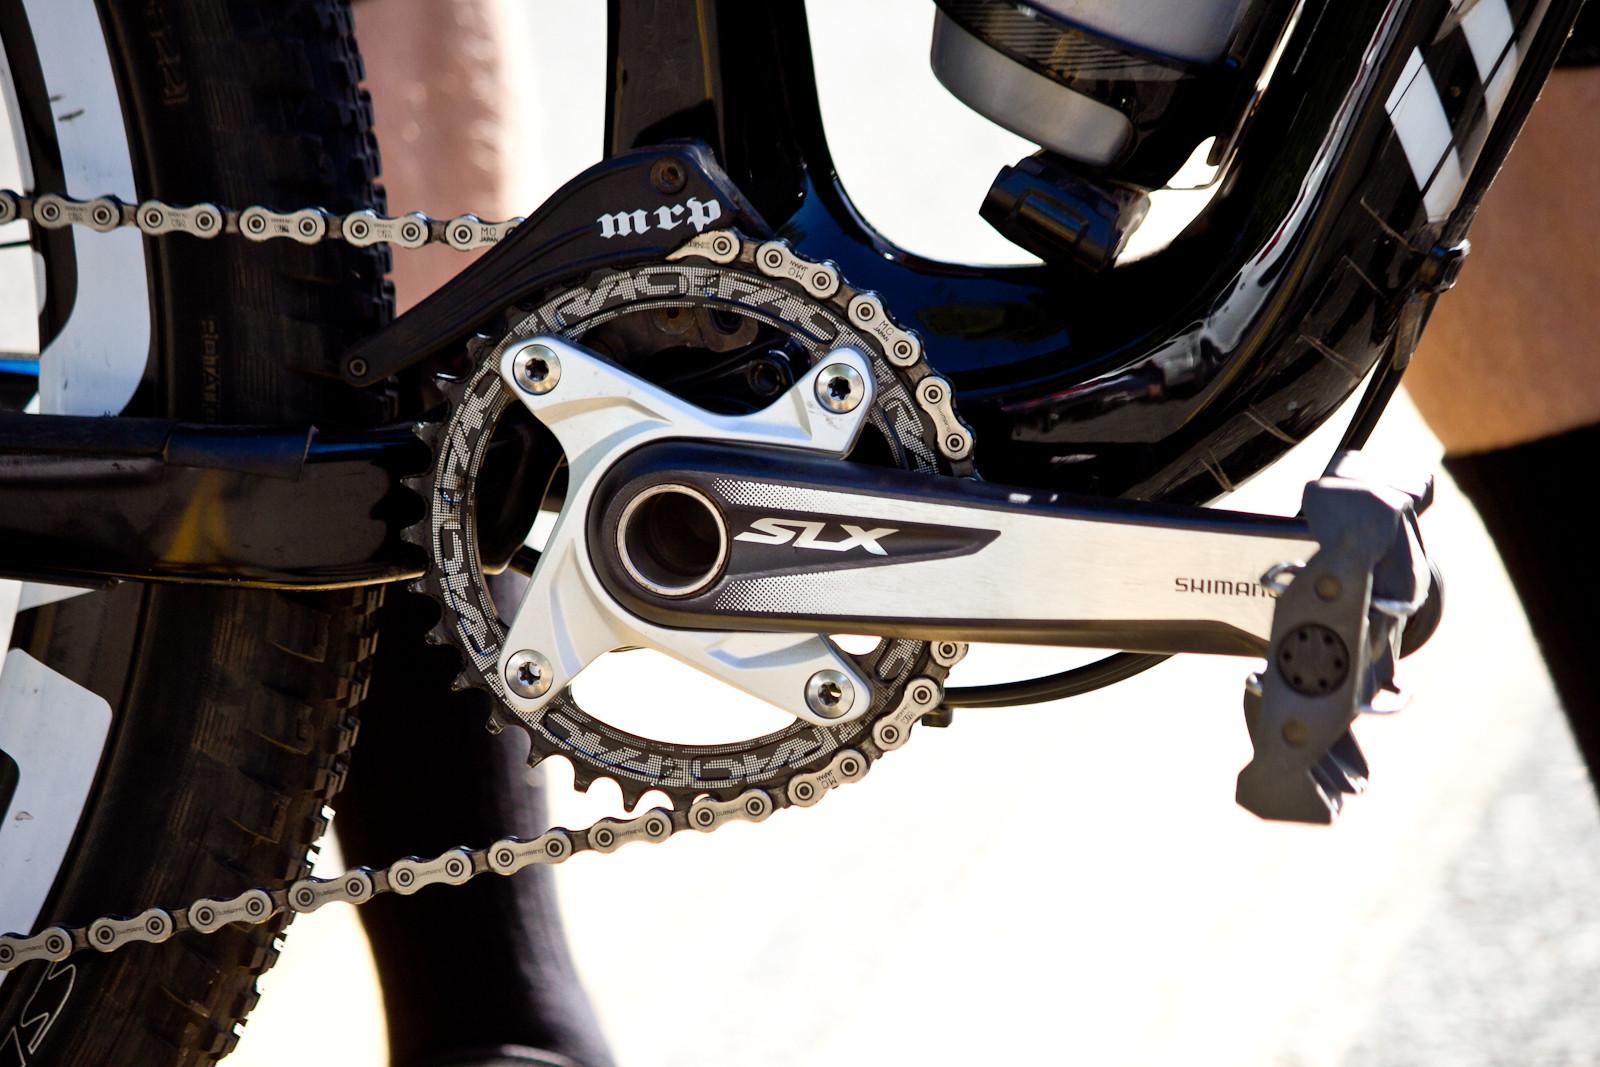 Shimano SLX Crankset on Cody Kelley's Stumpjumer FSR EVO 29 - Pro Bike Check: Cody Kelley's Specialized Stumpjumper FSR EVO 29 - Mountain Biking Pictures - Vital MTB